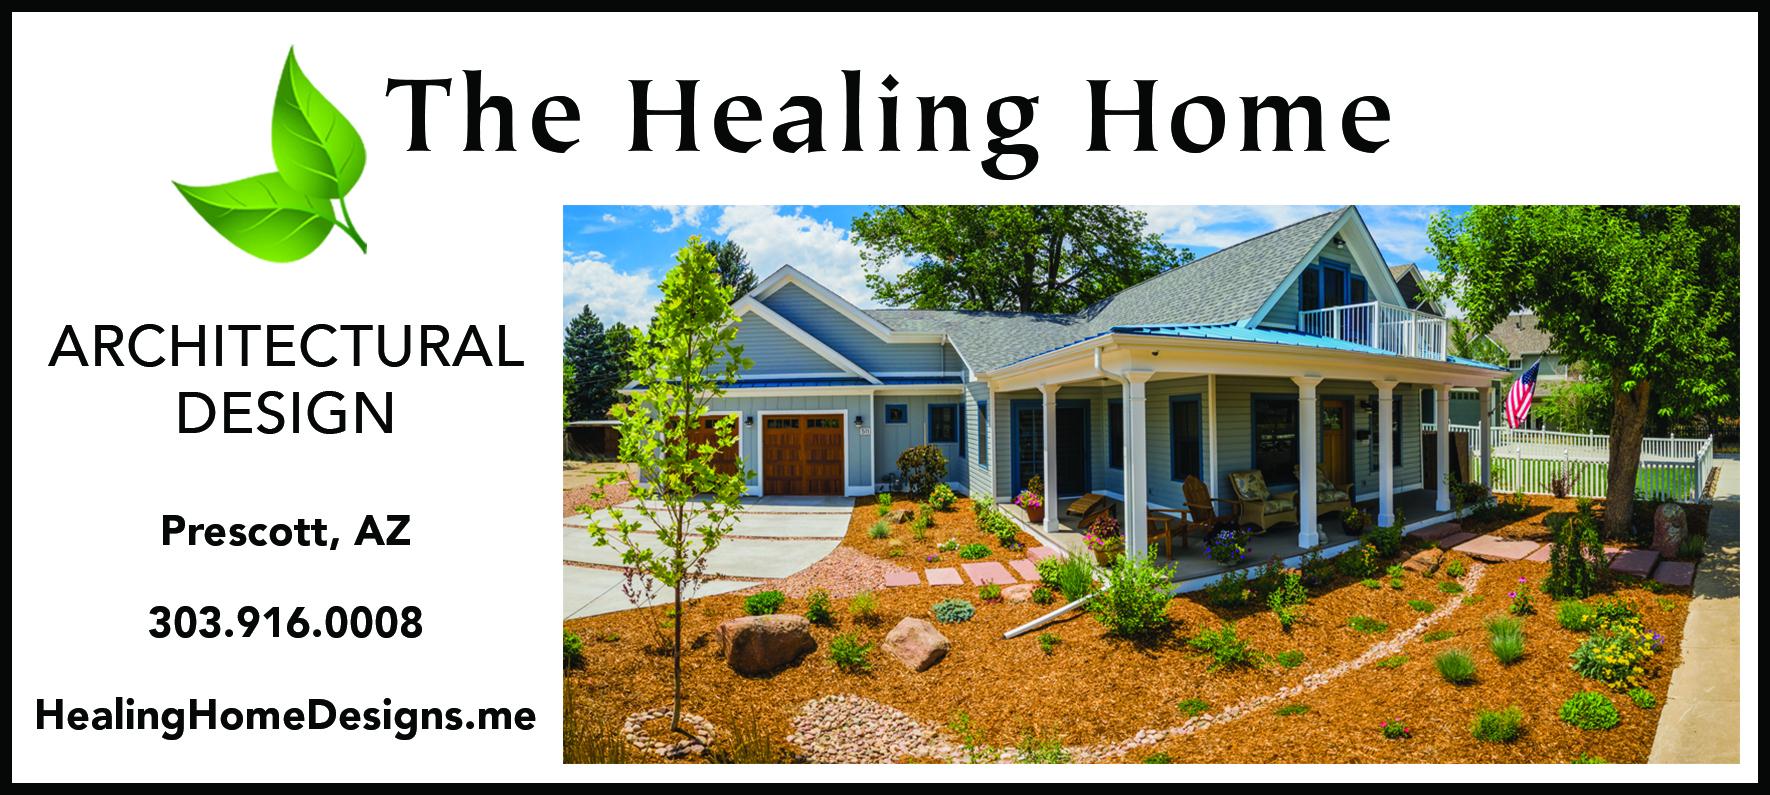 Healing Home Designs